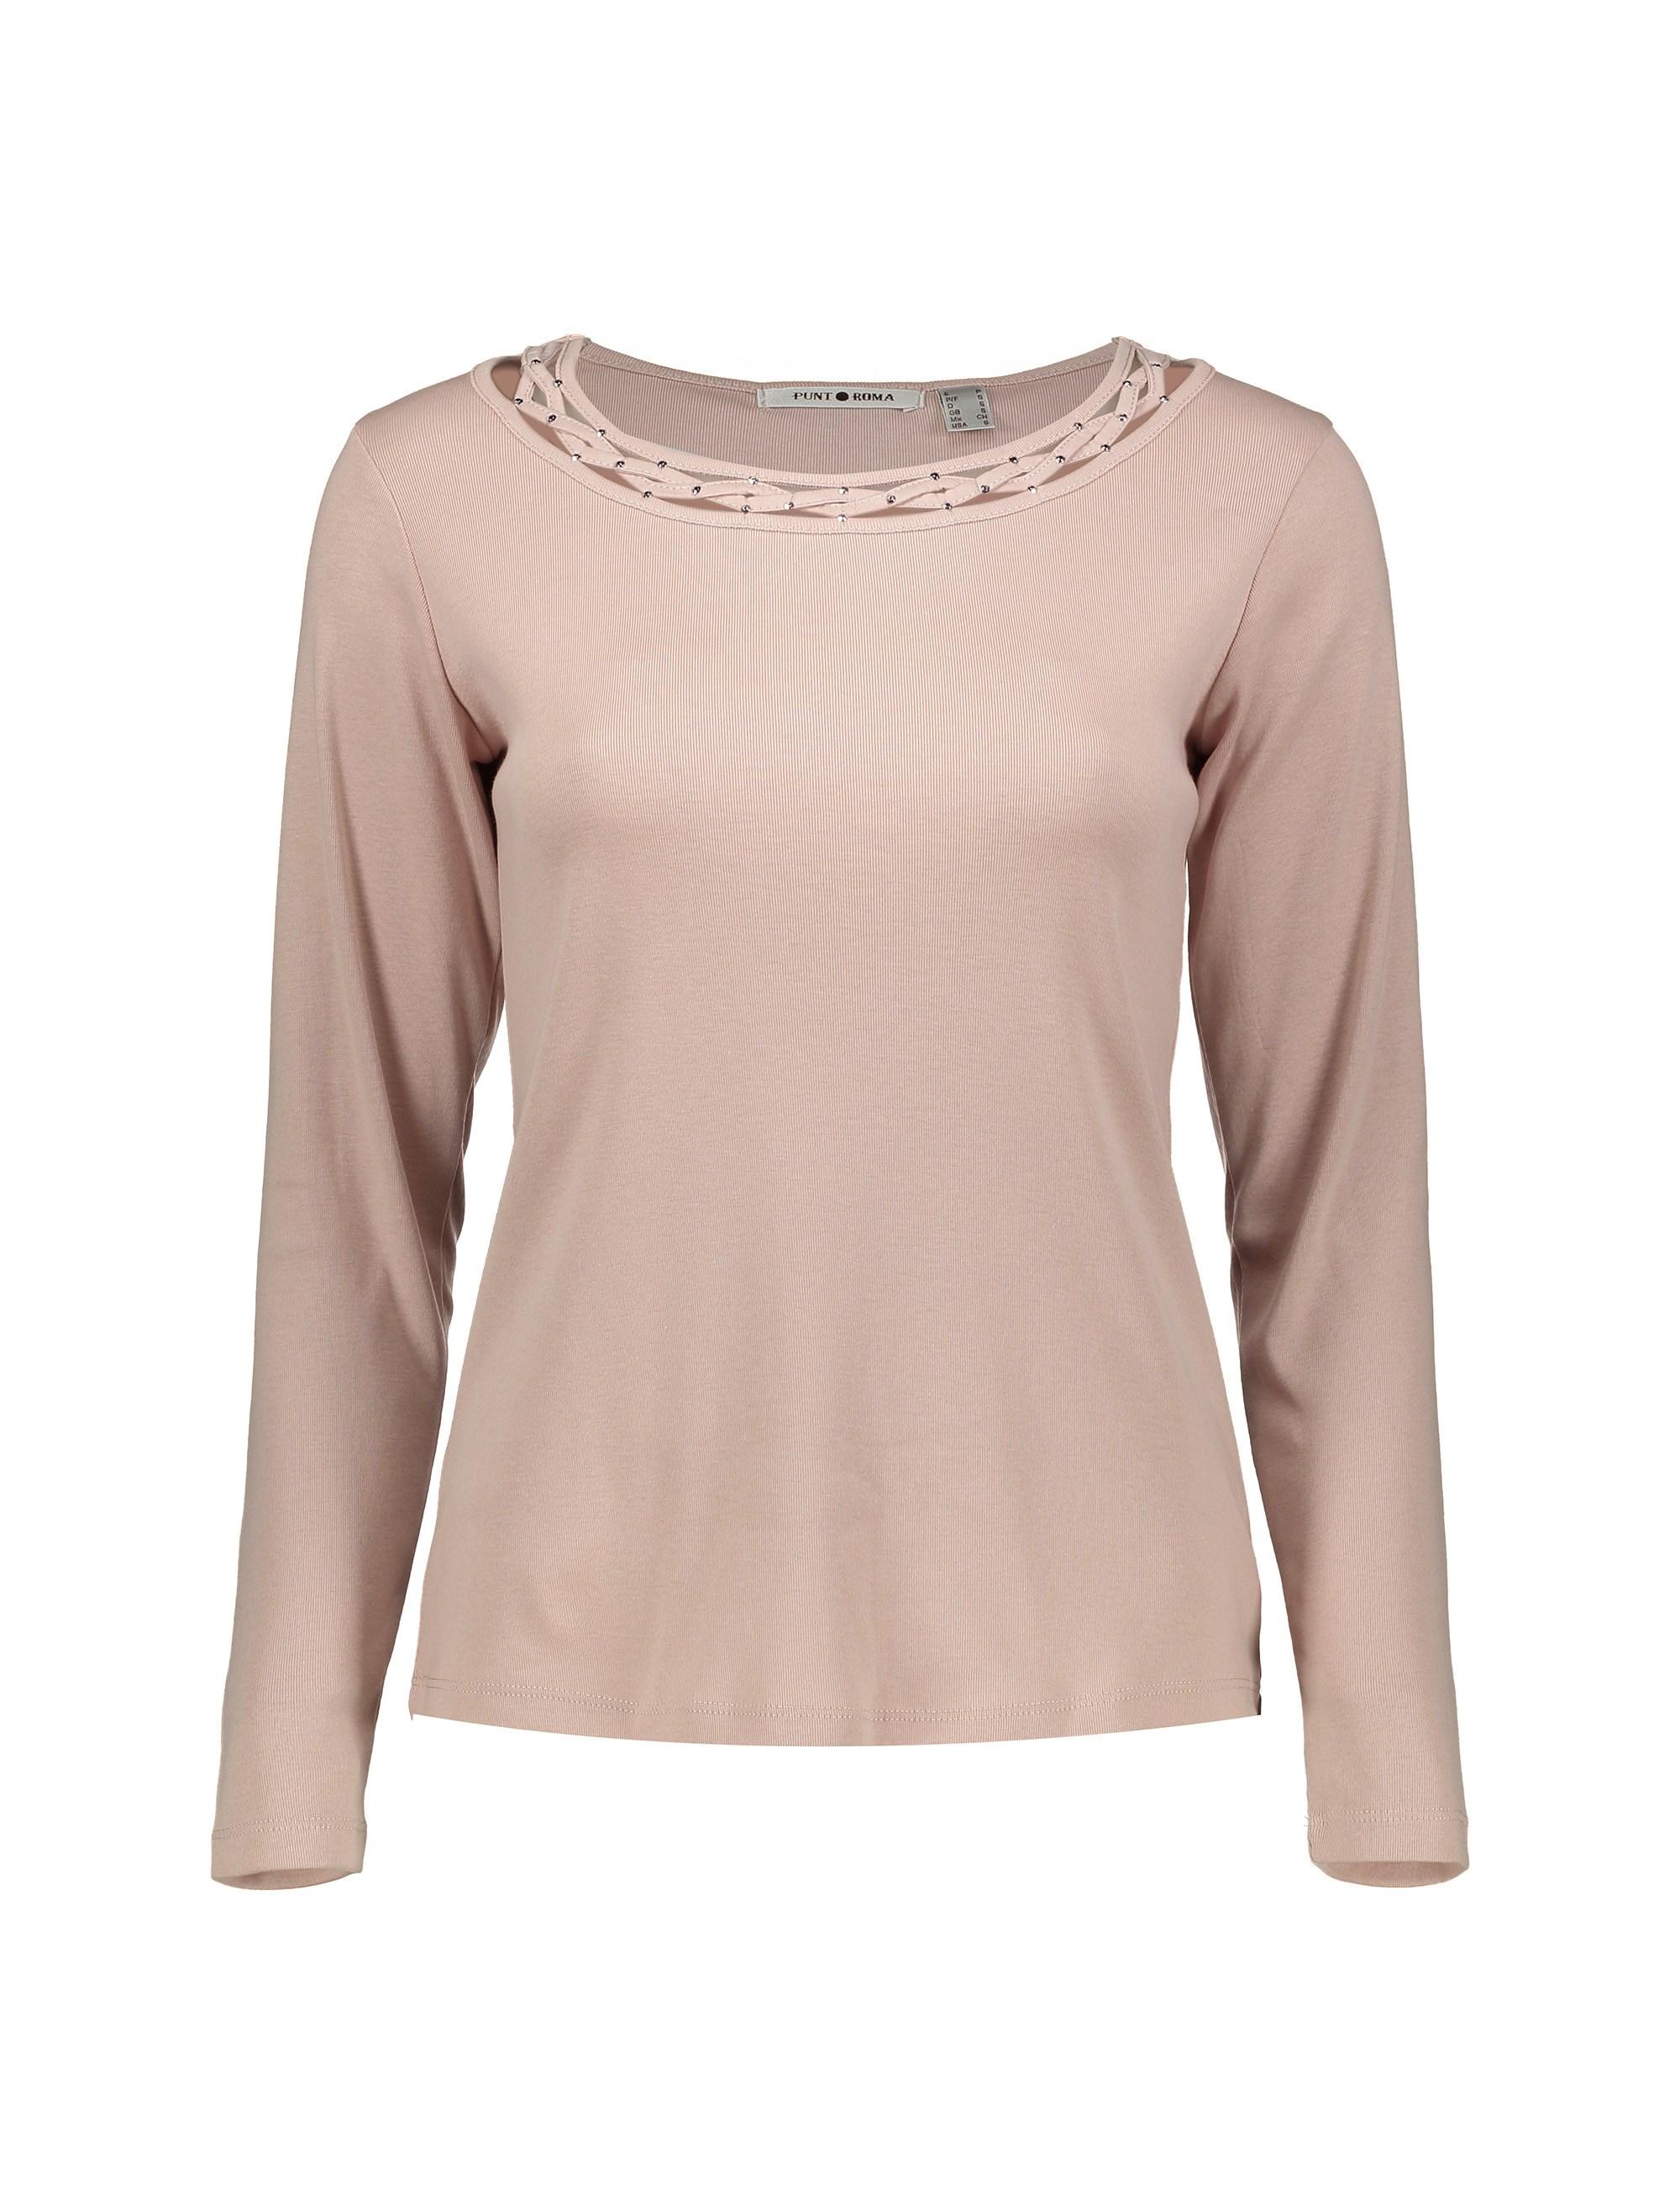 تی شرت آستین بلند زنانه – پونت روما  Women Long Sleeve T-shirt – Punt Roma